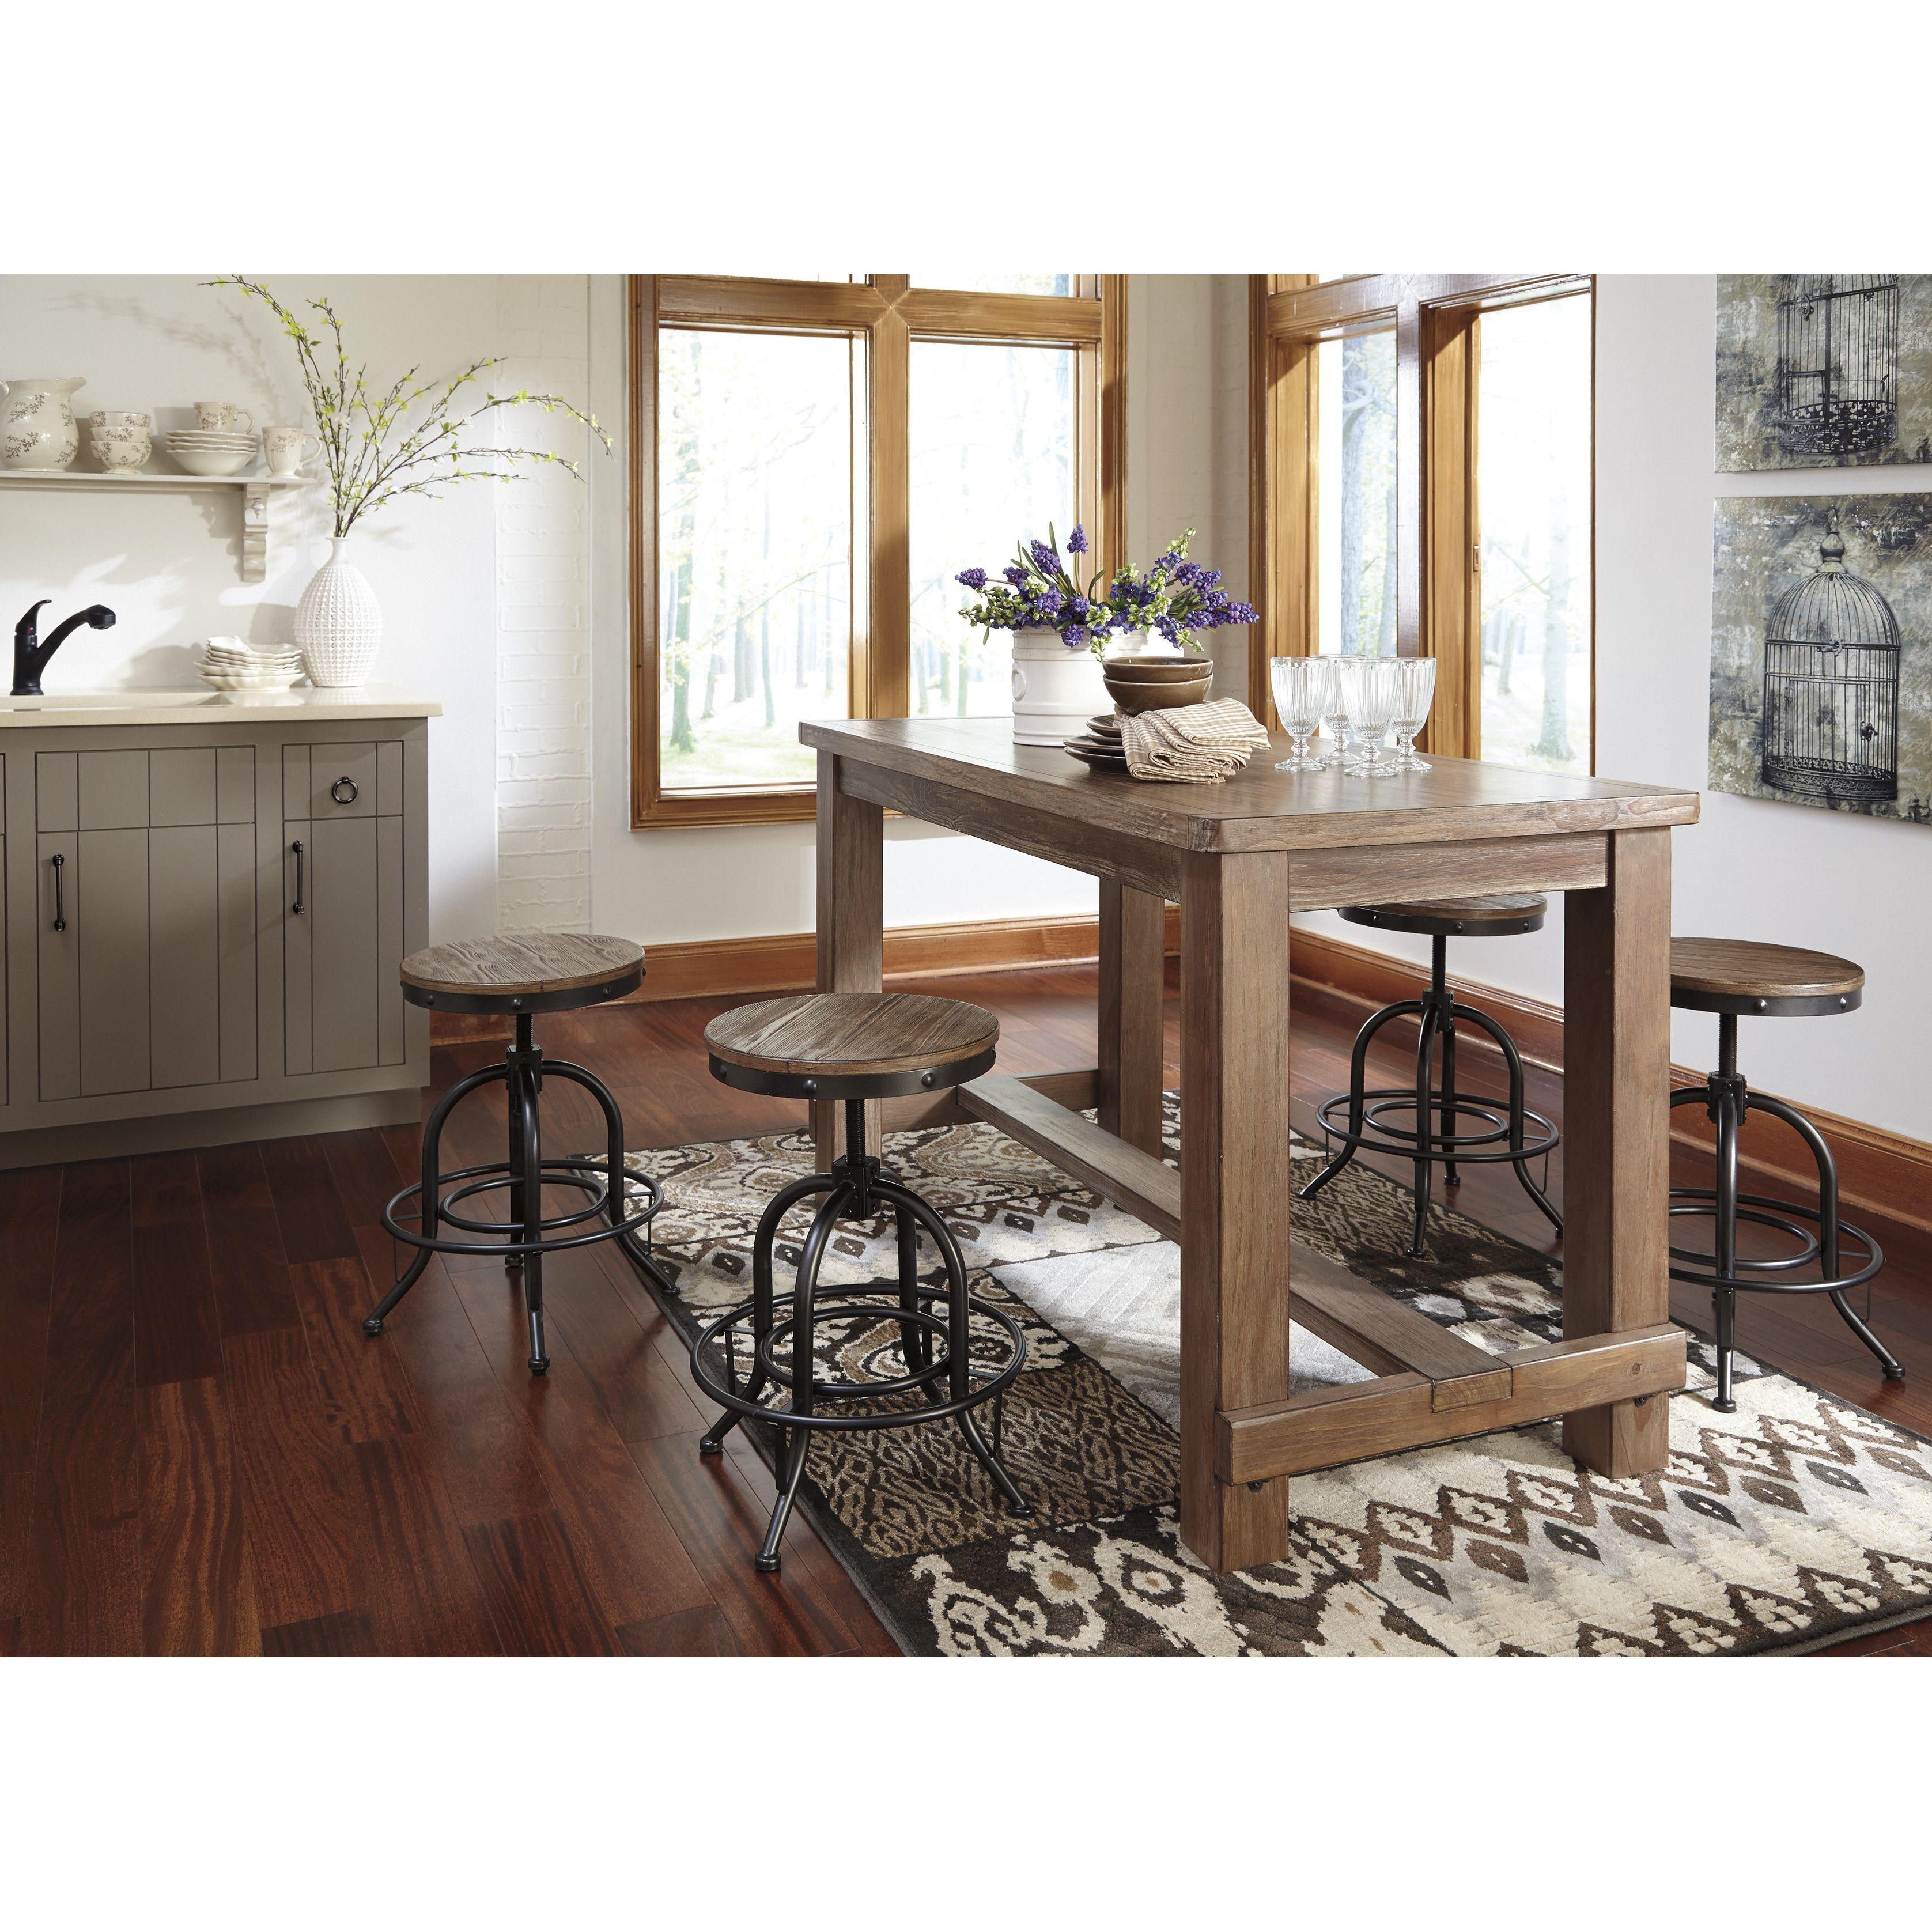 Industrial Farmhouse Kitchen trent austin design carmel dining table | wish list | pinterest